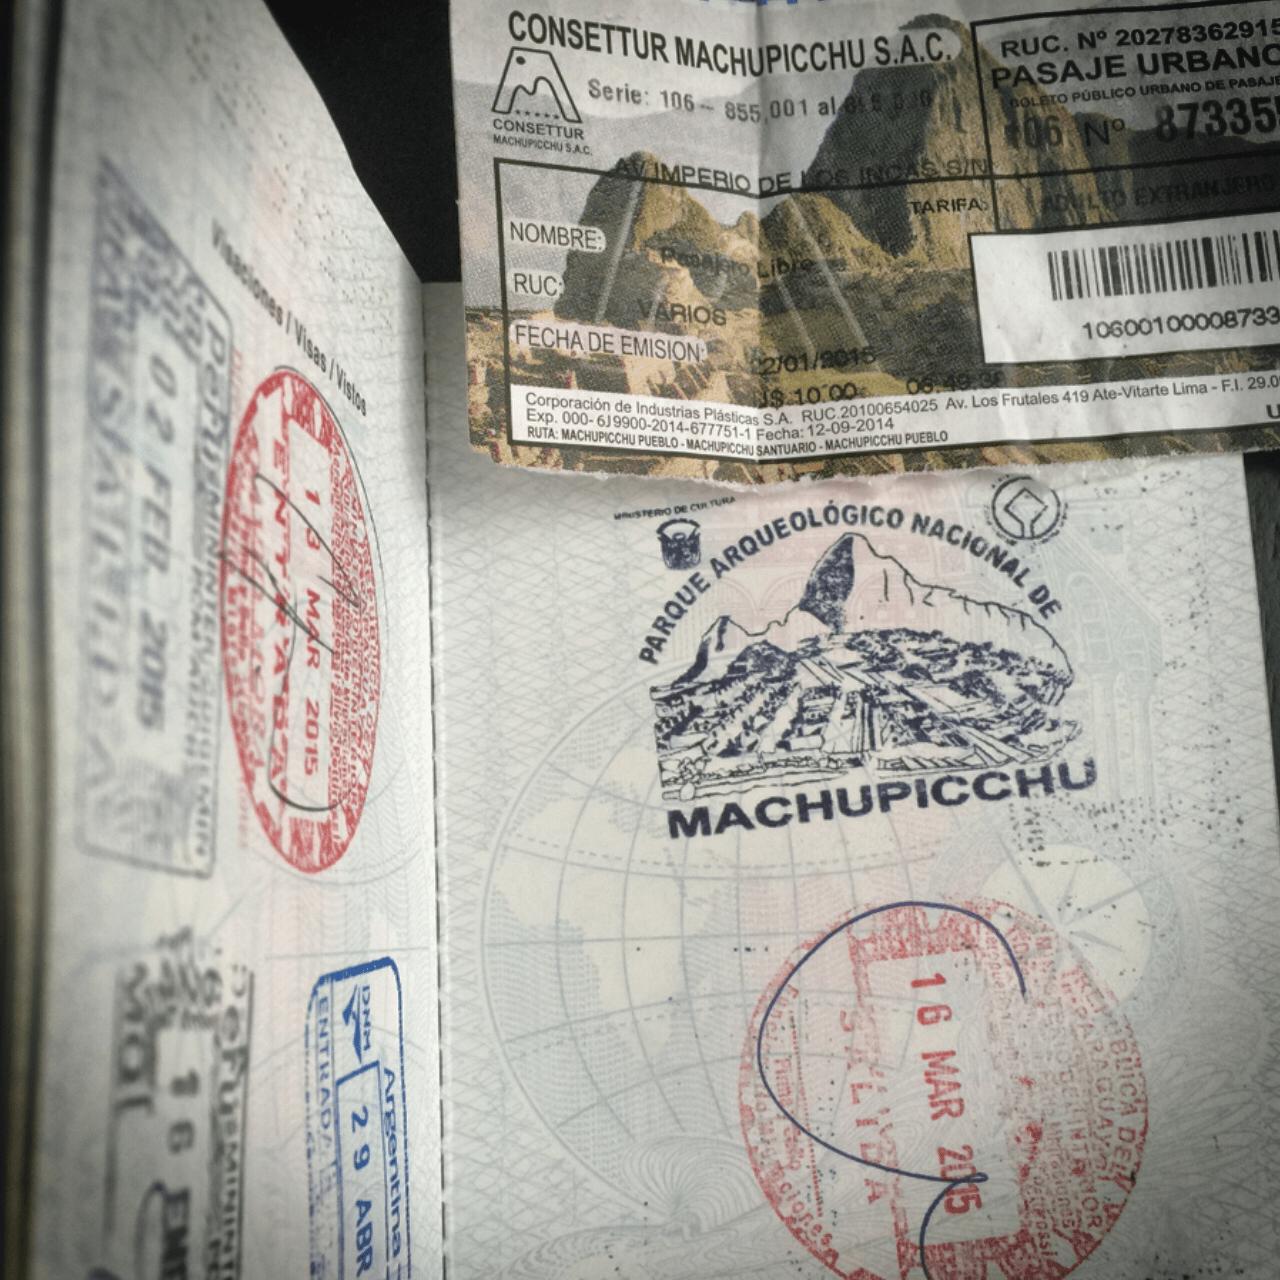 Como llegar a Machu Picchu desde Brasil